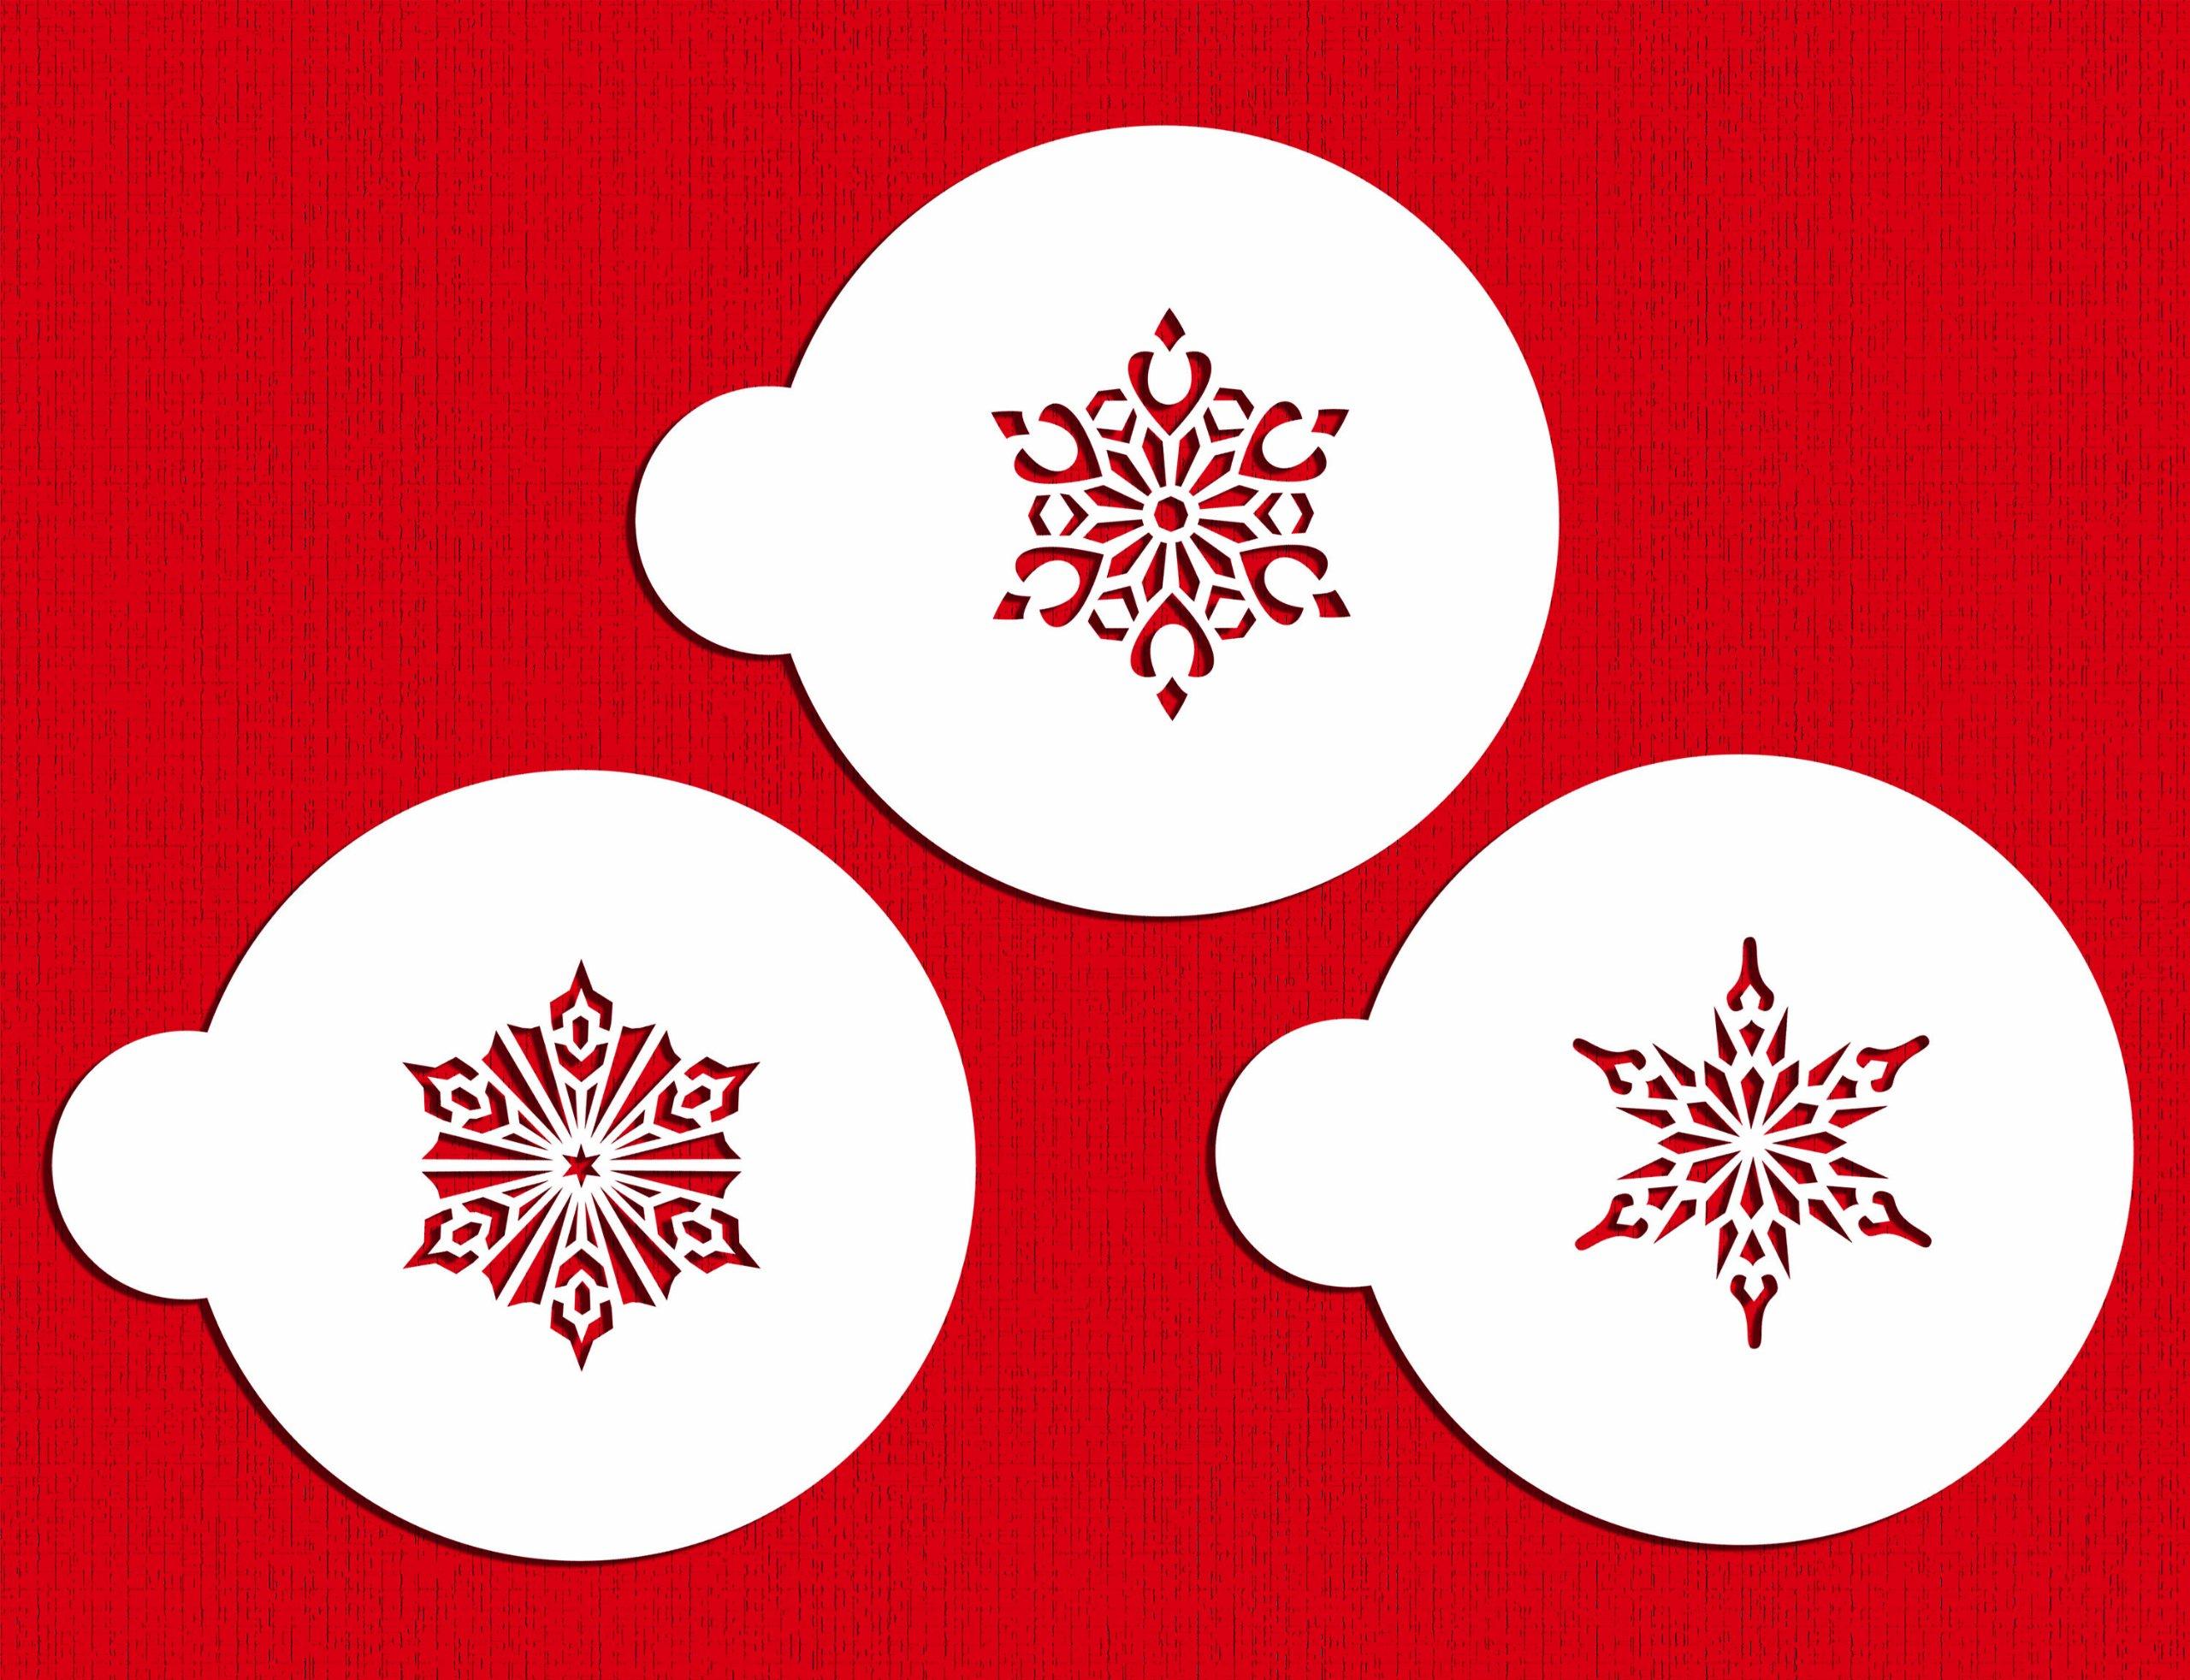 Designer Stencils C747 Small Crystal Snowflakes 2 Cookie Stencils, Beige/semi-transparent